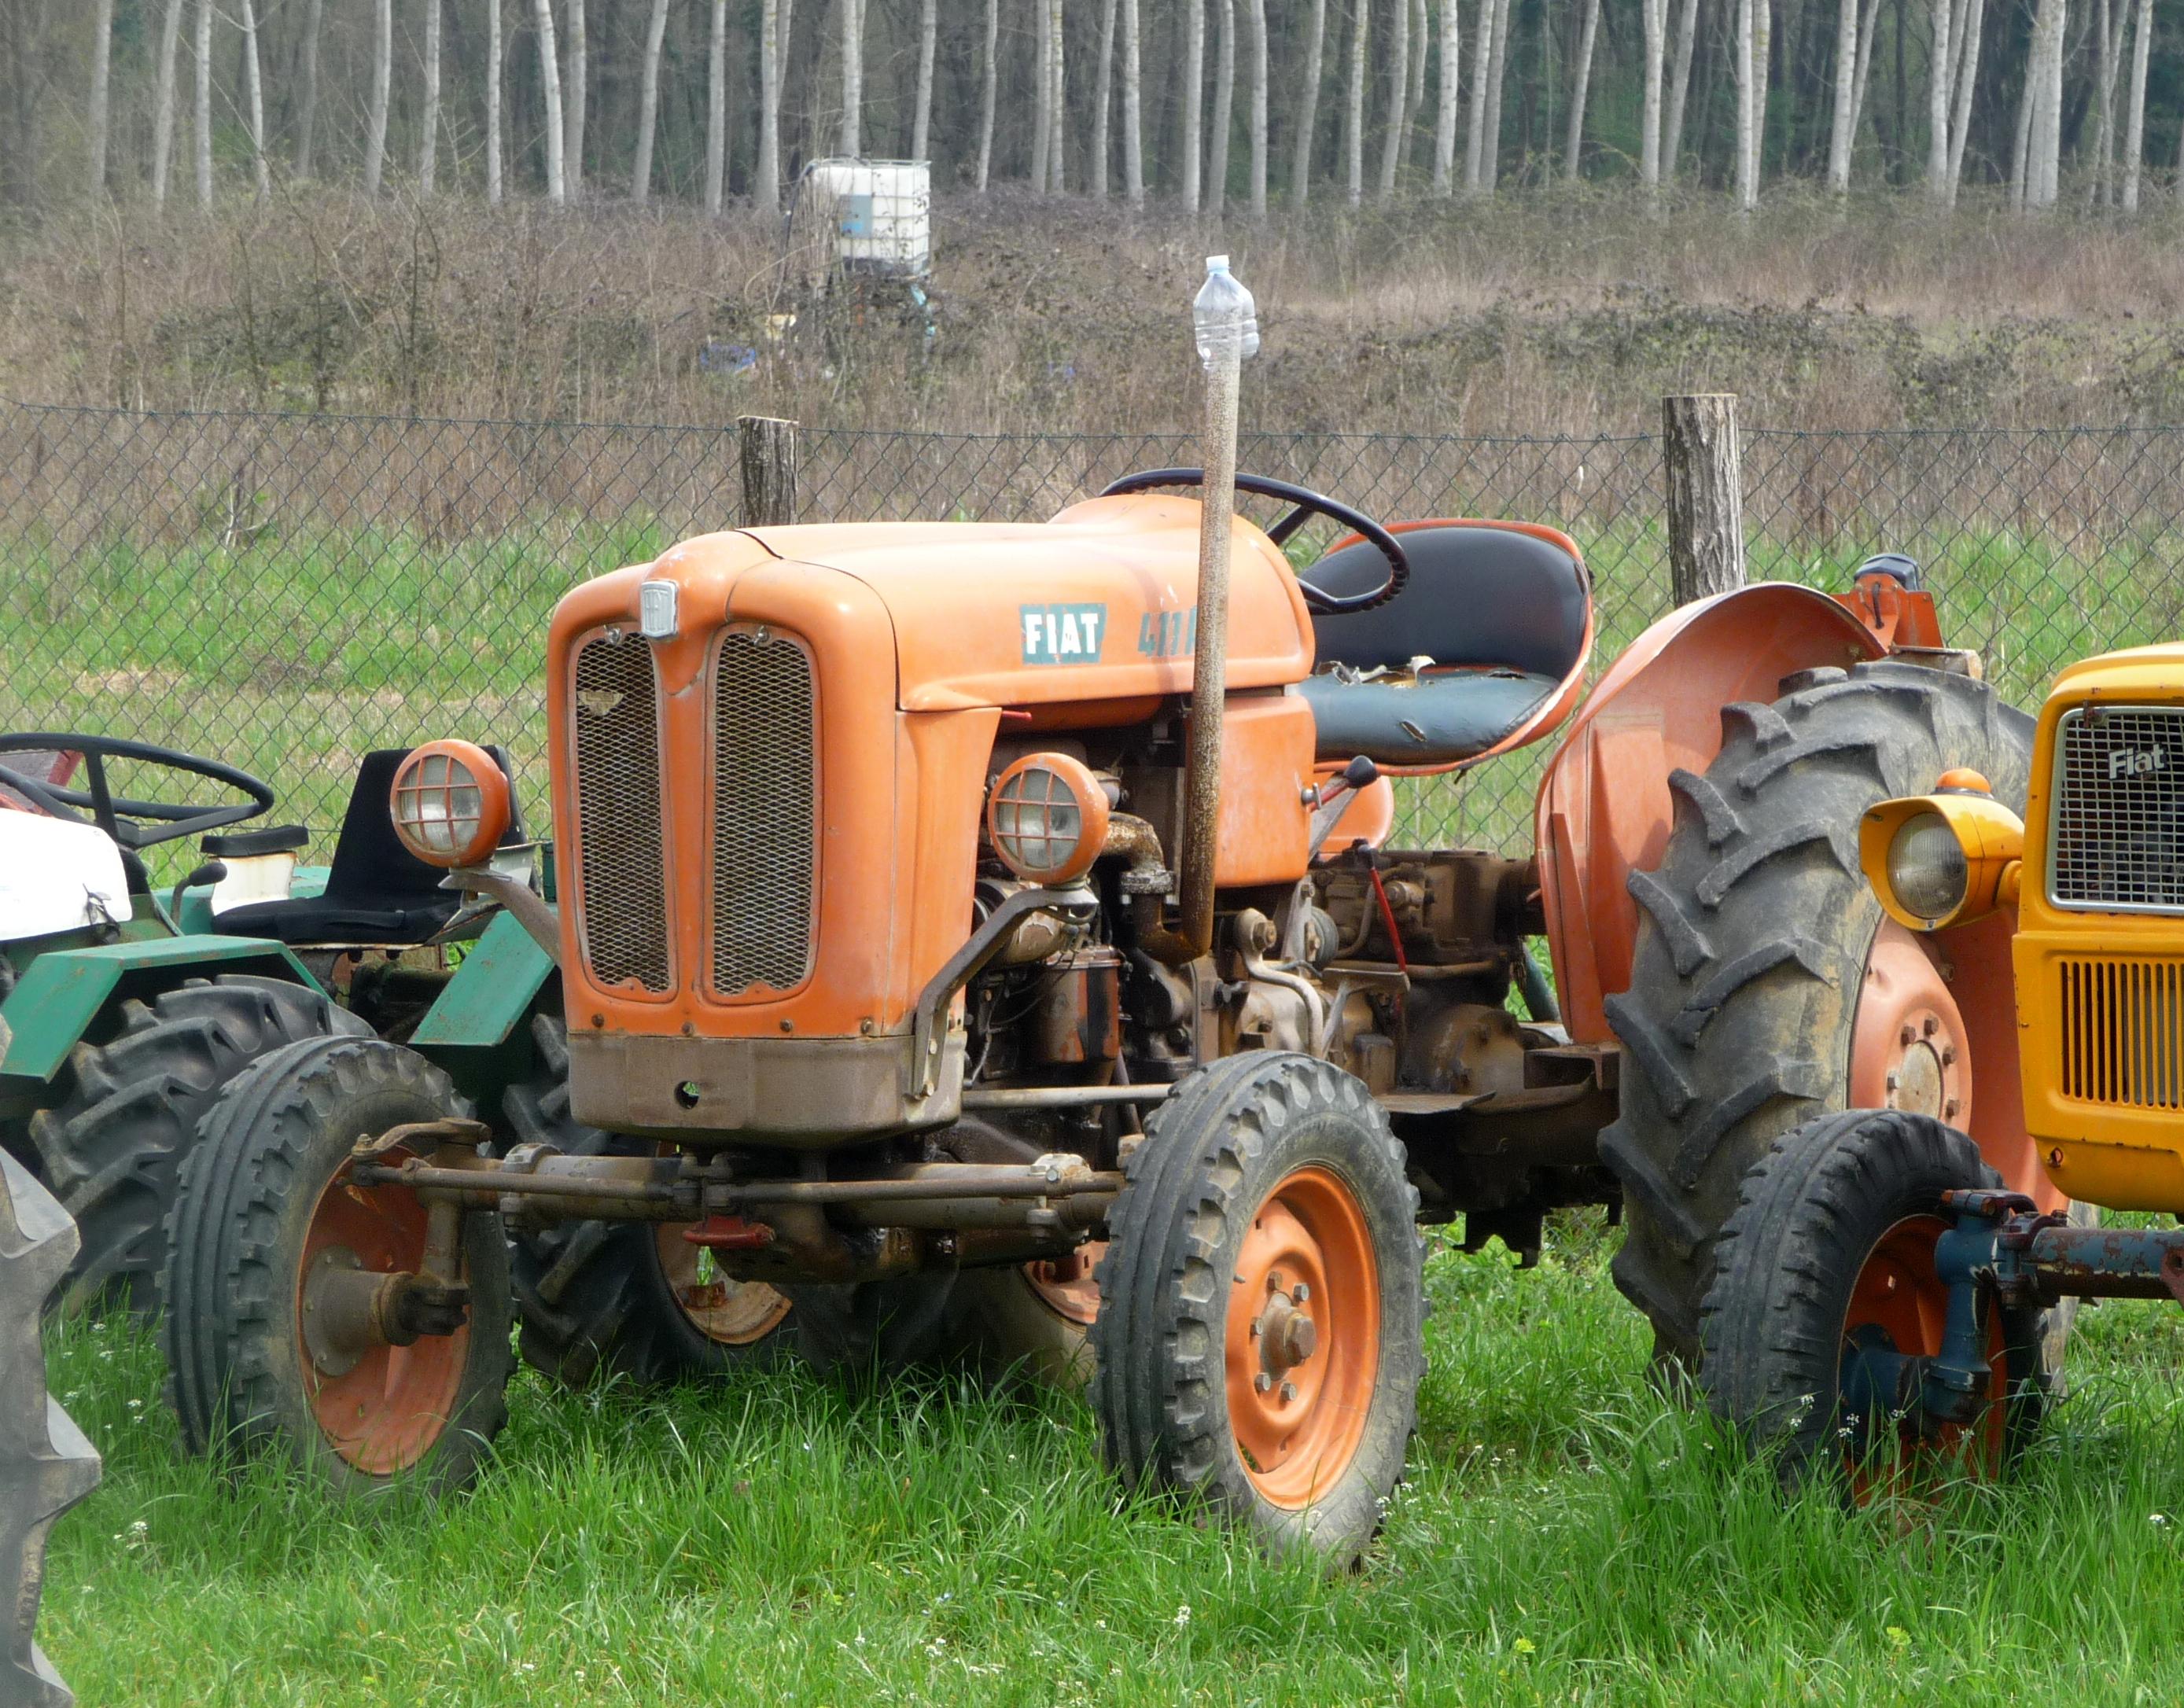 File Fiat 411 R Tractor Jpg